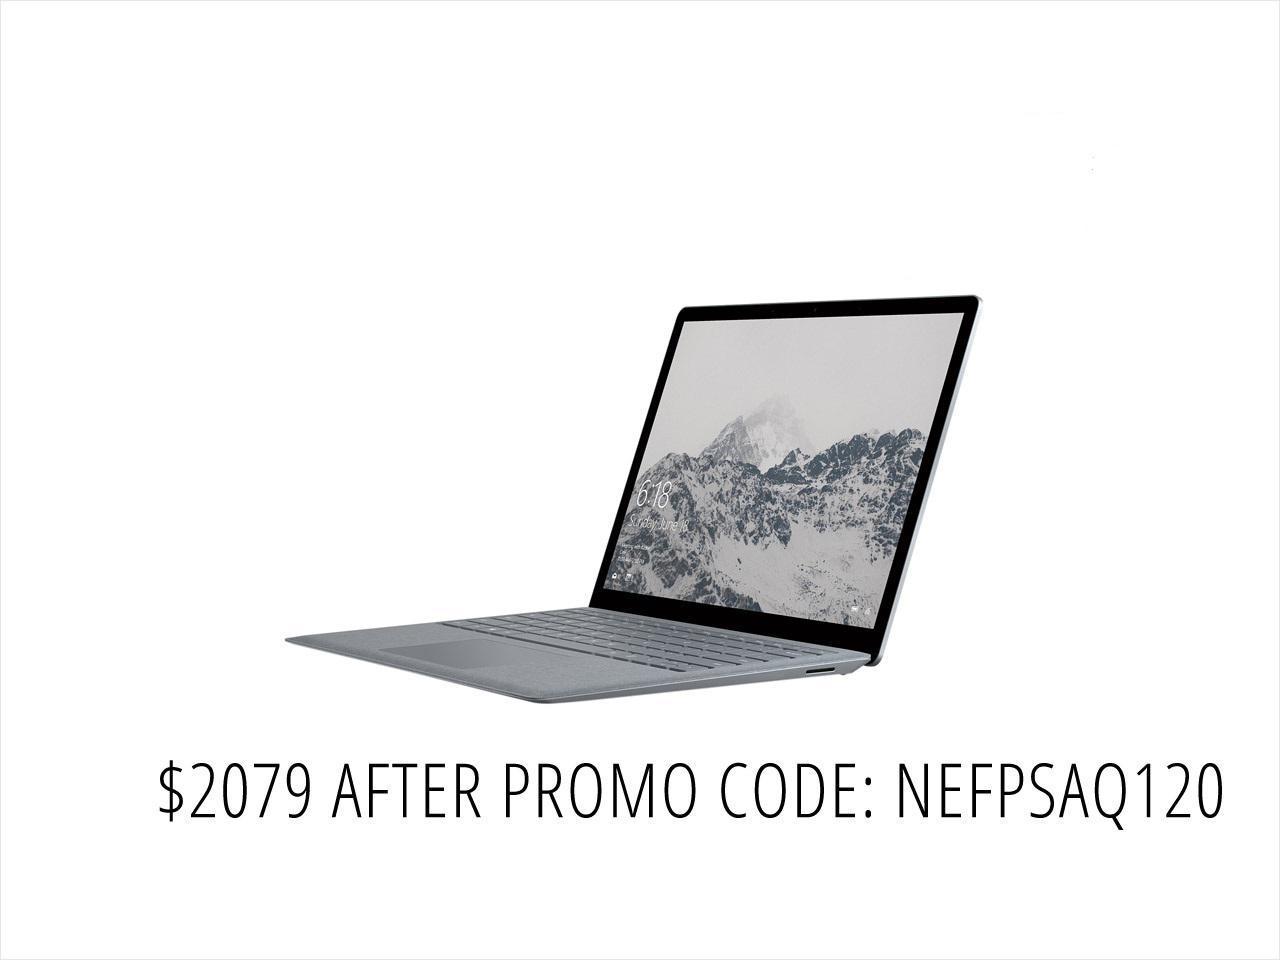 "Microsoft Surface 13.5"" Laptop DAL-00001 Intel Core i7 7th Gen 7660U (2.50 GHz) 16 GB Memory 512 GB SSD Intel Iris Plus Graphics 640 Touchscreen Windows 10 S - Platinum"